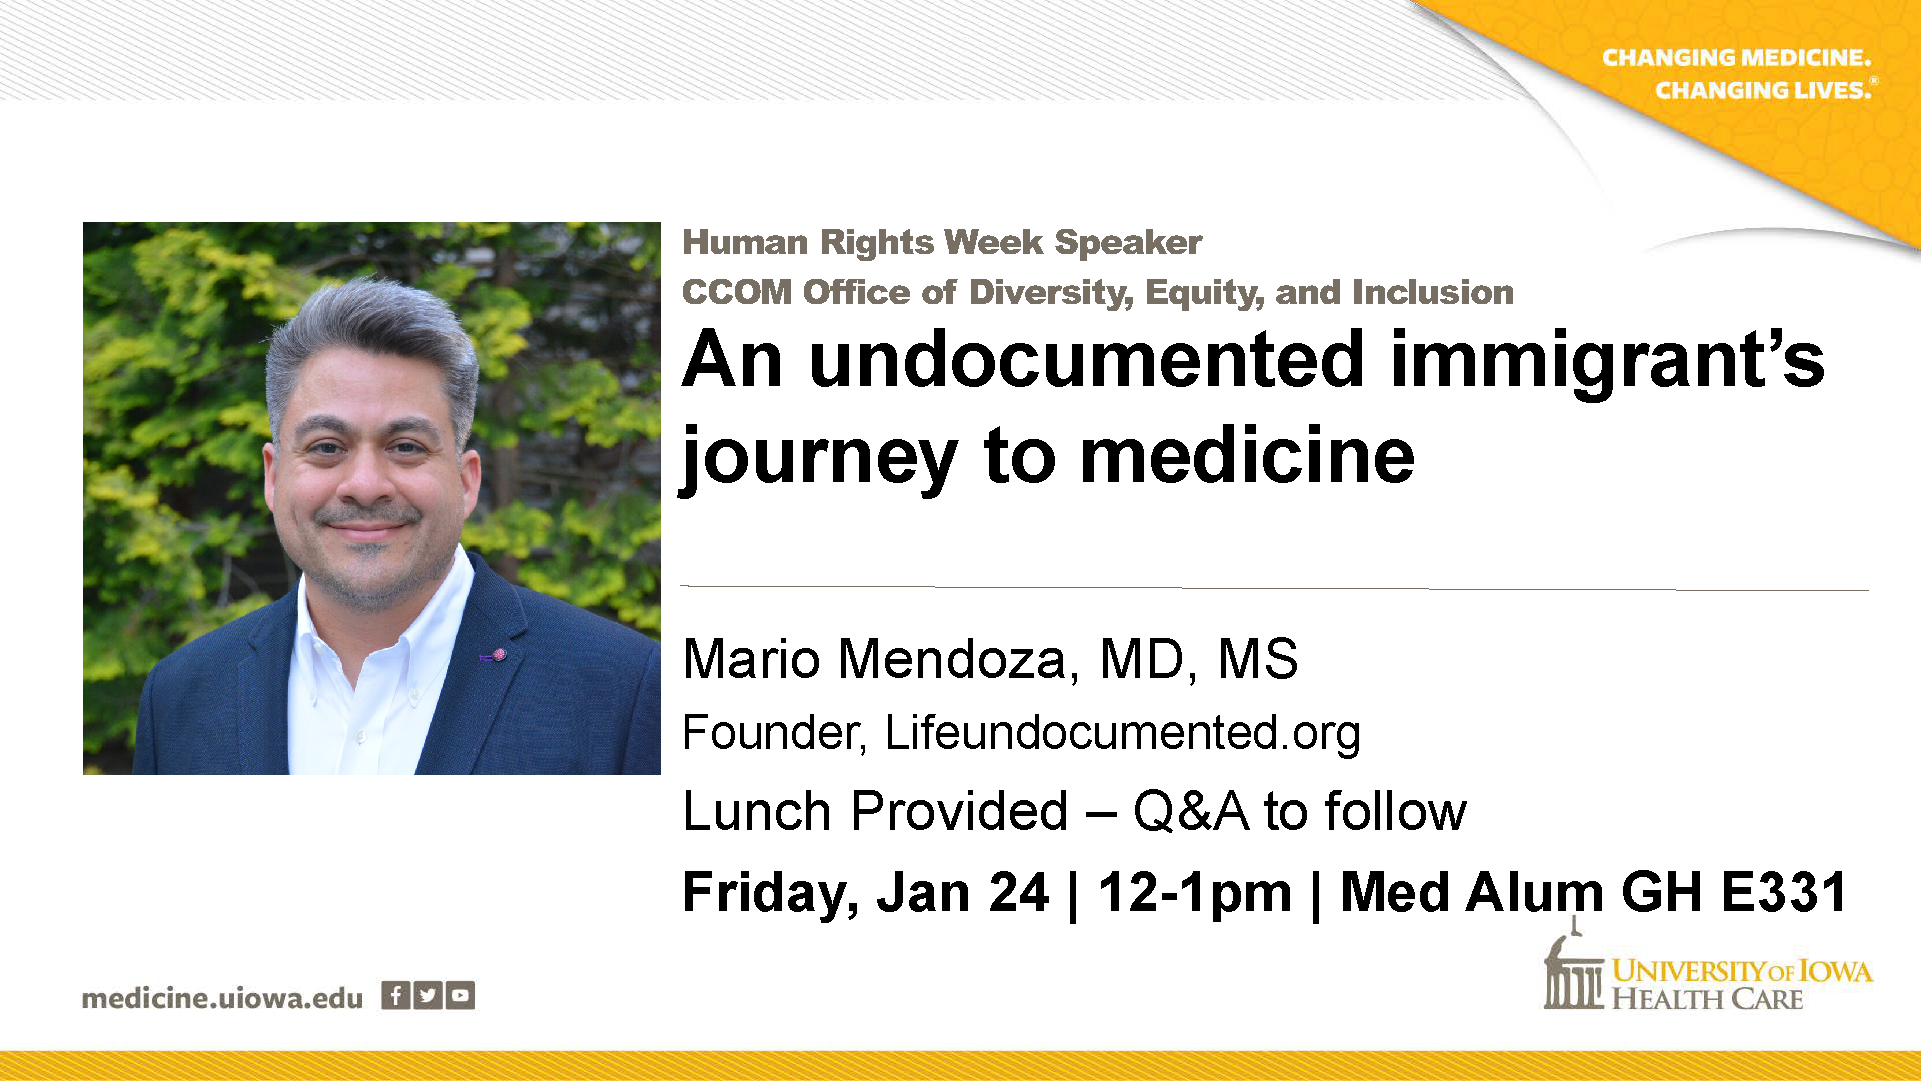 Dr. Mario Mendoza, Life UNdocumented